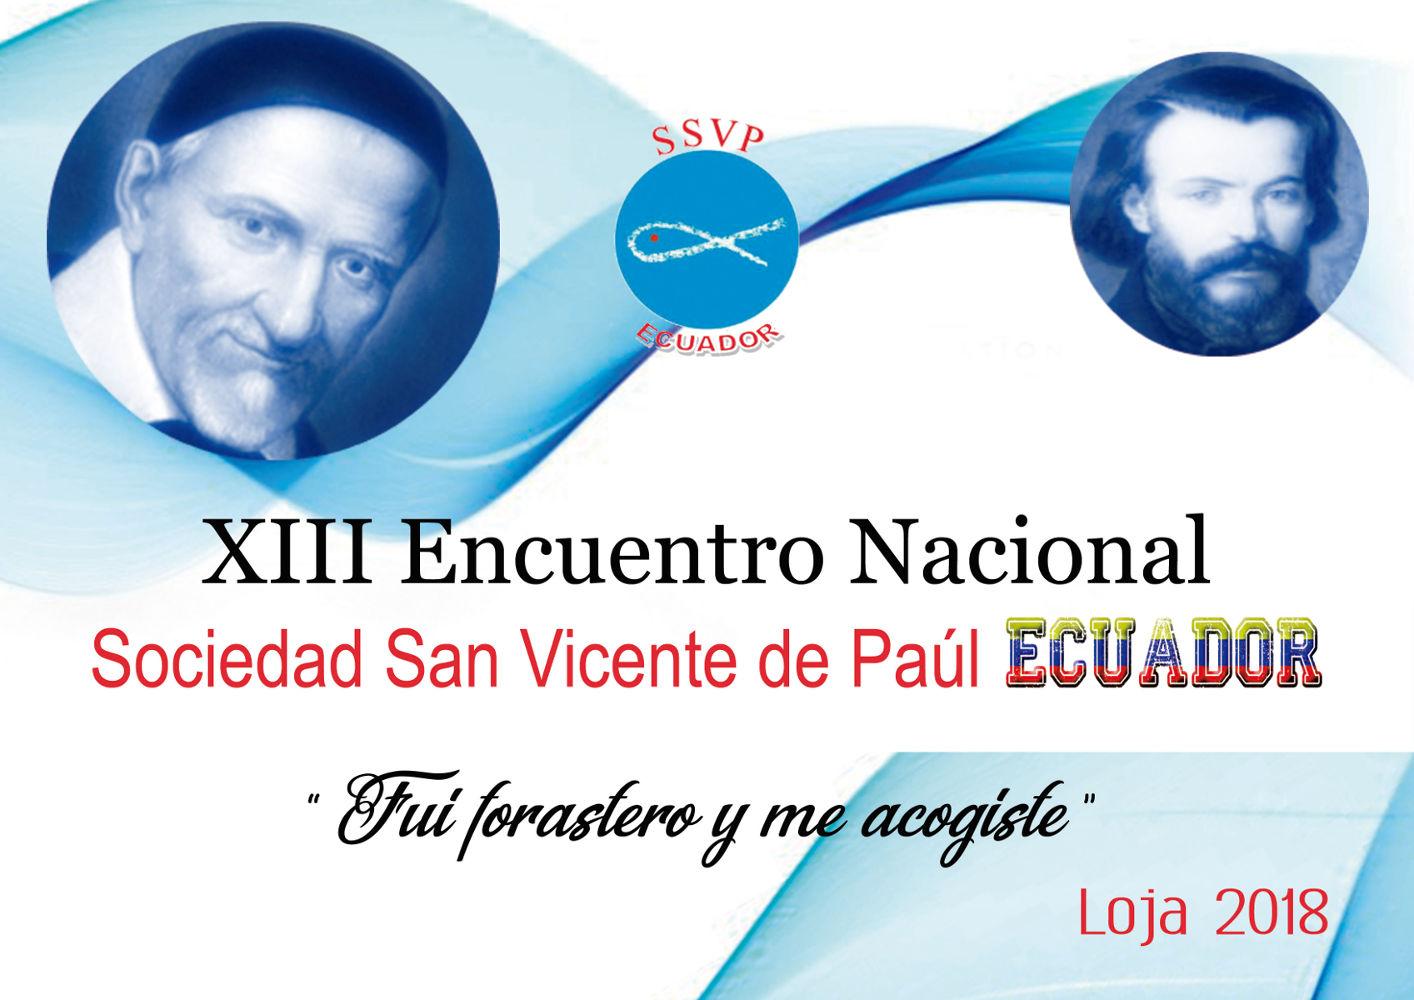 XIII Encuentro Nacional SSVP 2018